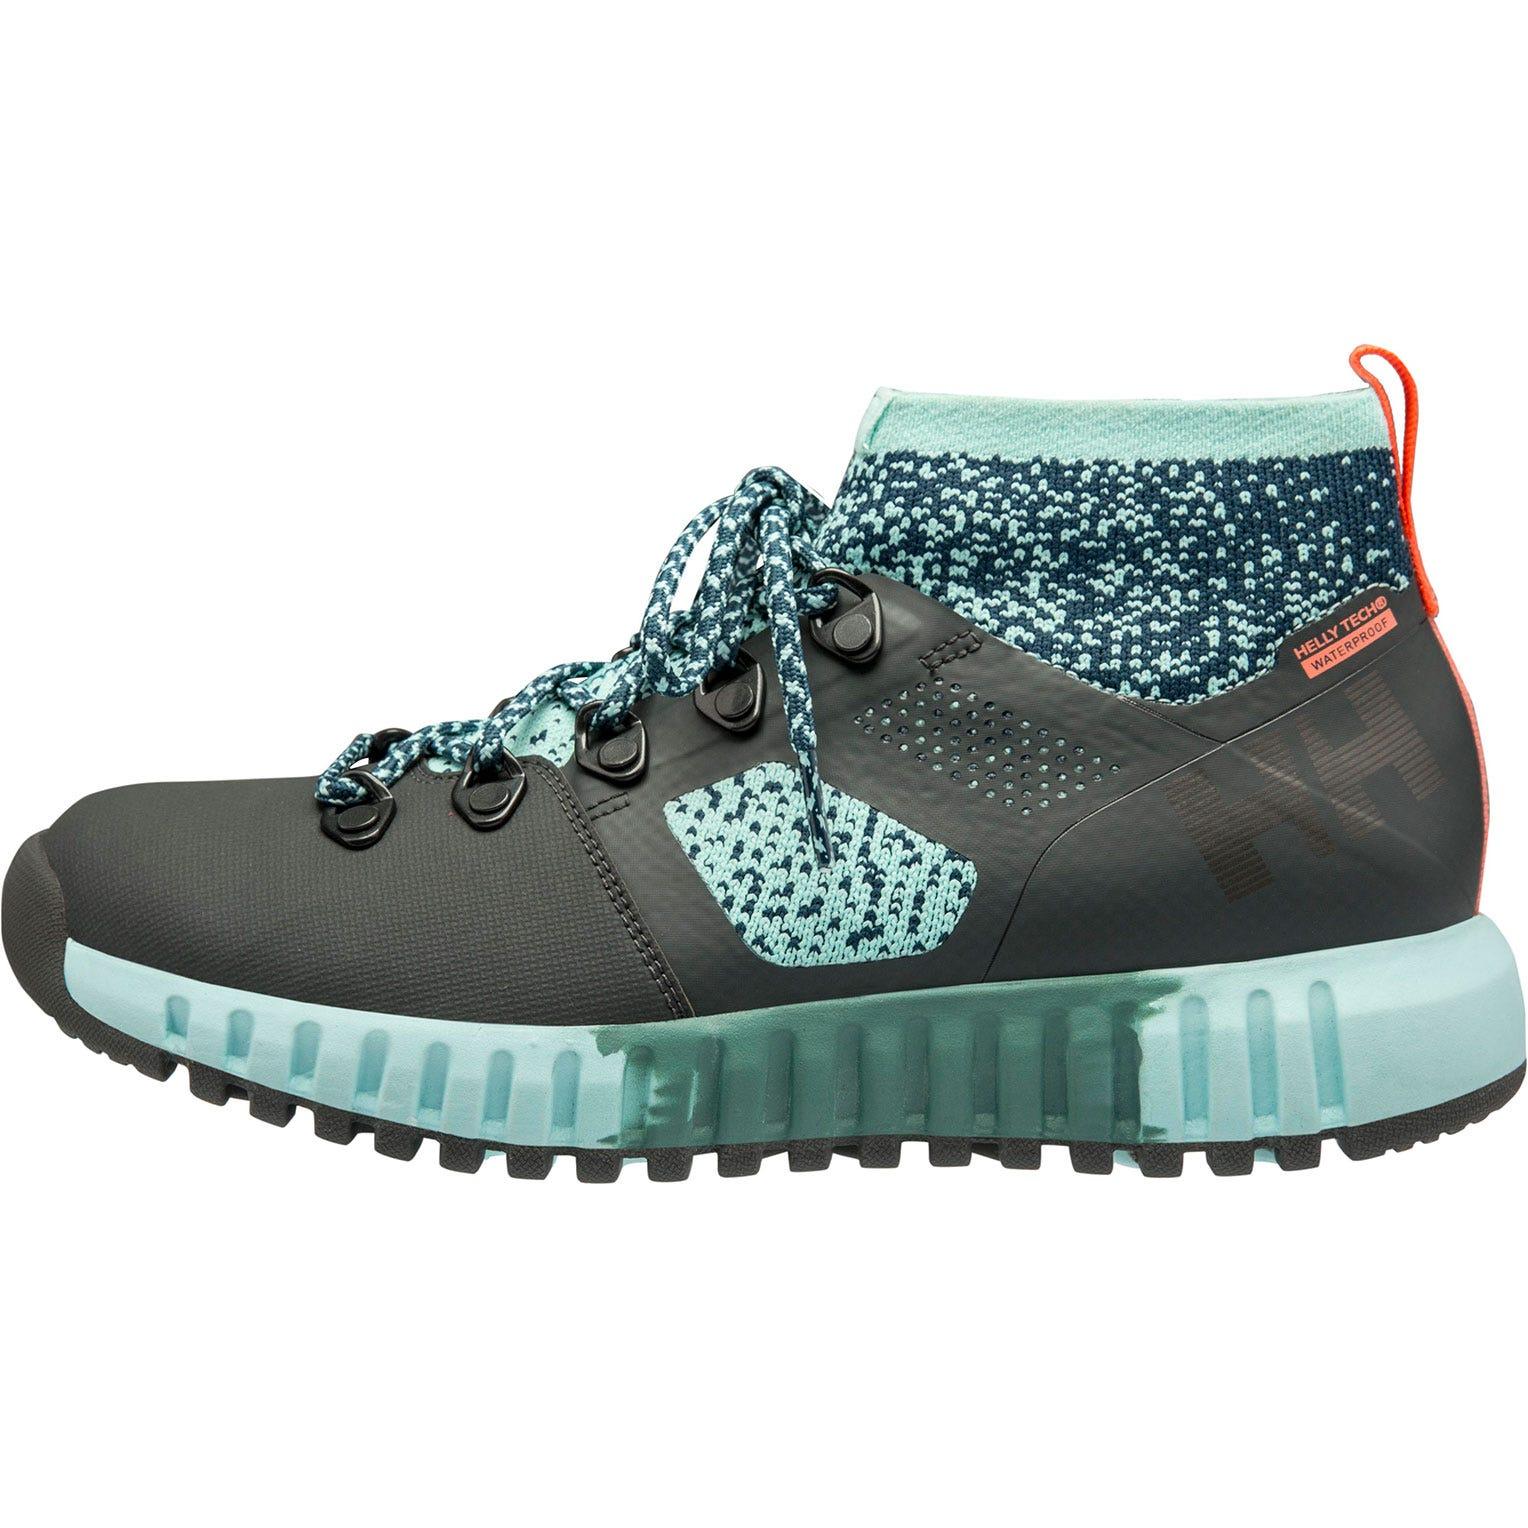 Helly Hansen W Vanir Canter Ht Womens Hiking Boot Black 39.3/8